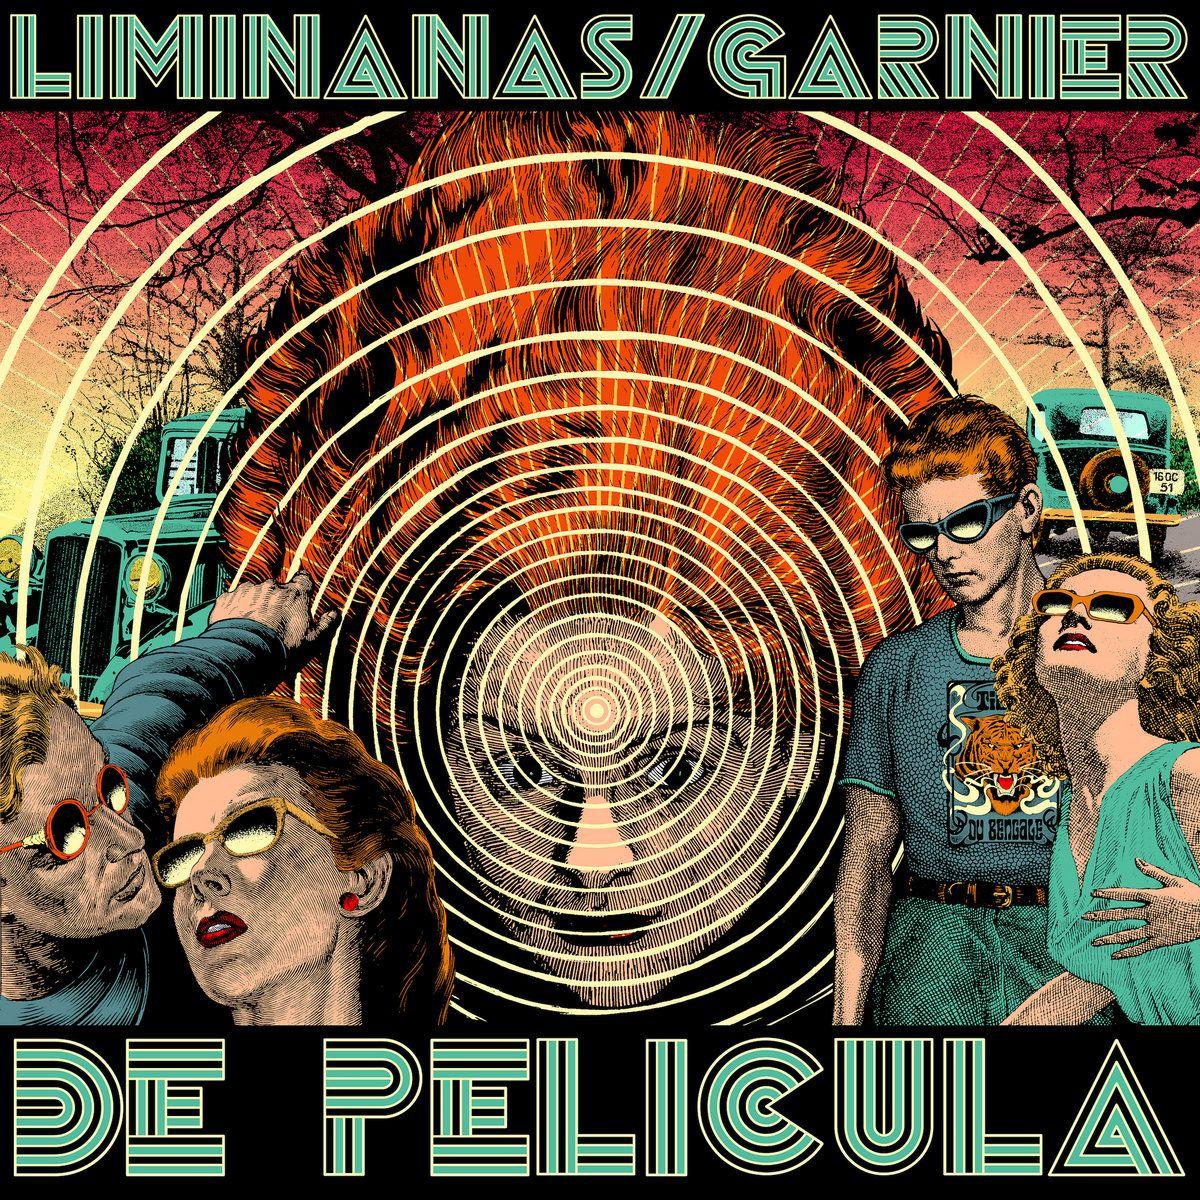 The Liminanas & Laurent Garnier - De Pelicula - 2LP